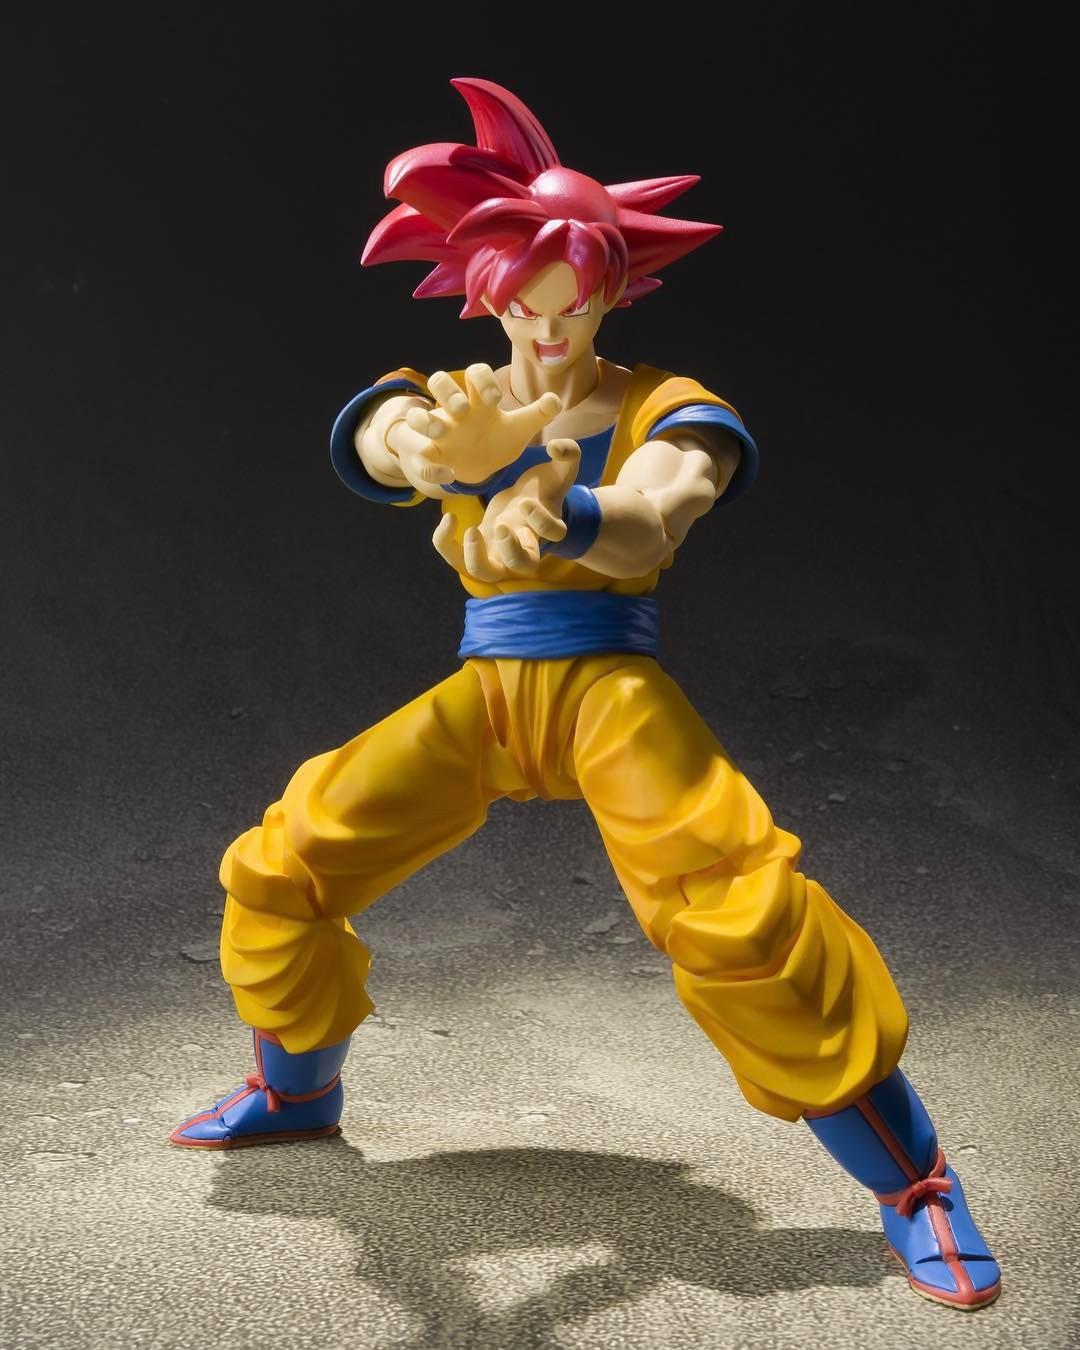 S.H. Figuarts Dragonball Z Super Saiyan God Son Goku Preview